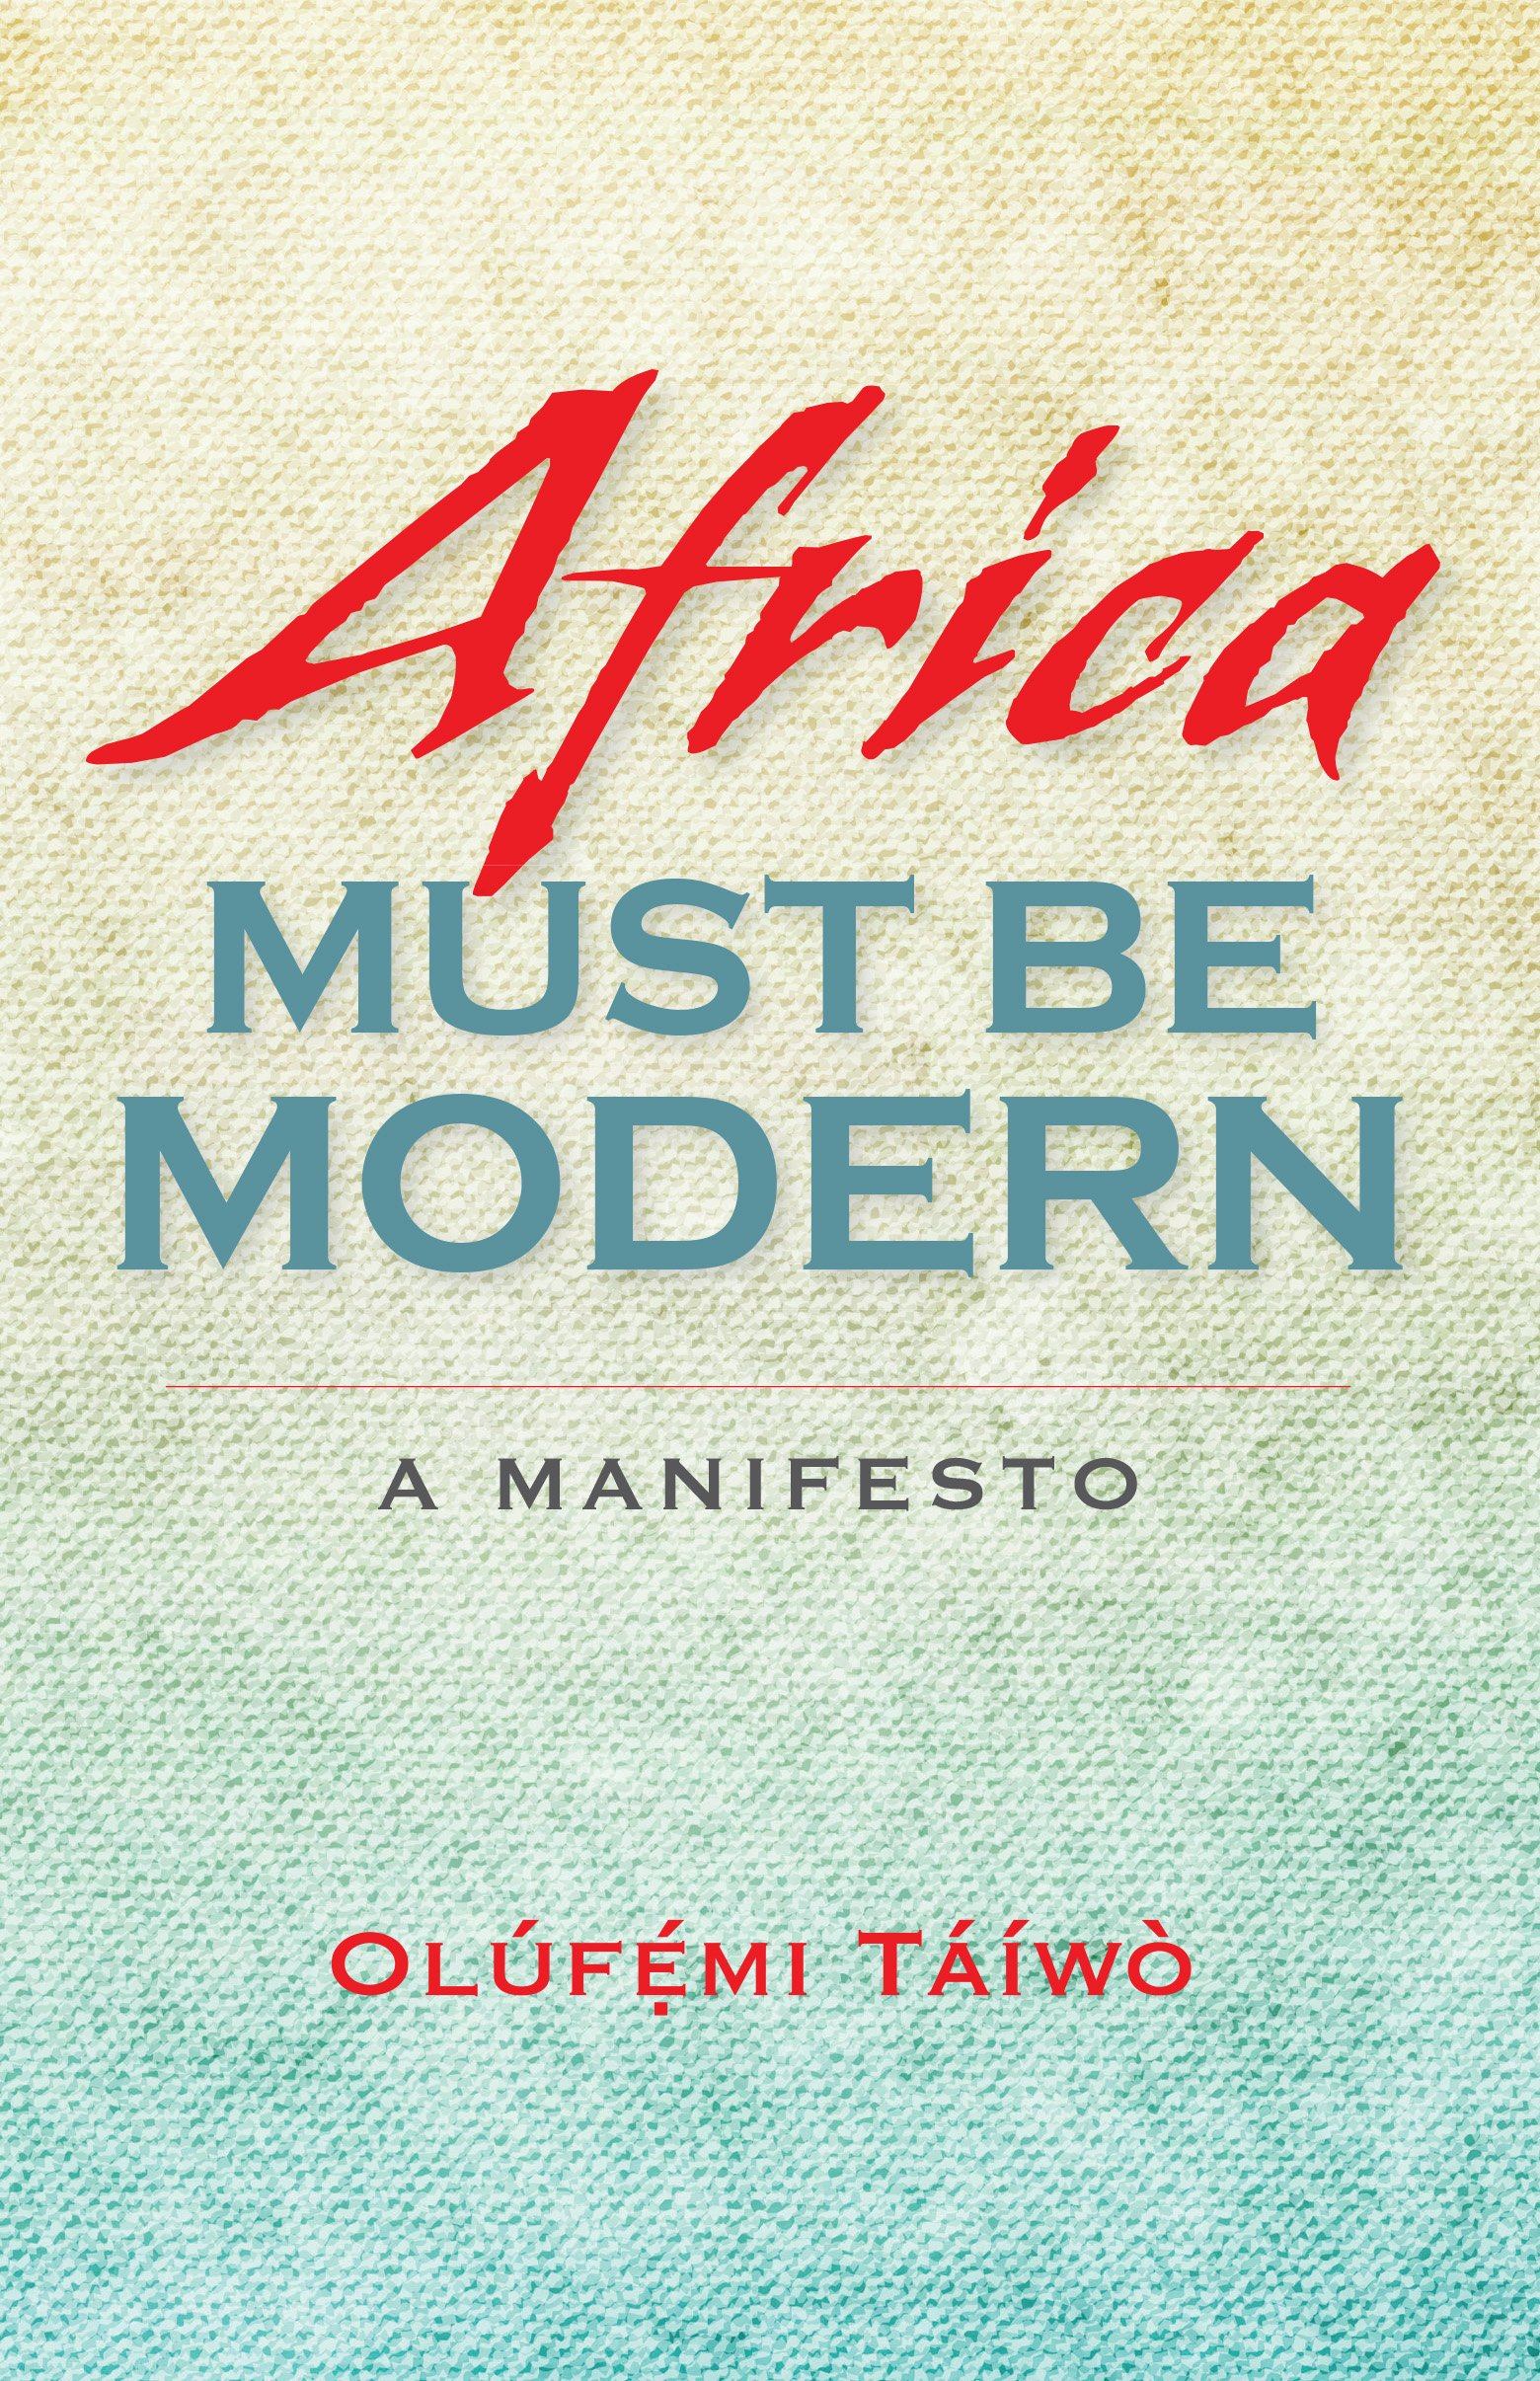 Recommended by: Chuka Madubunyi